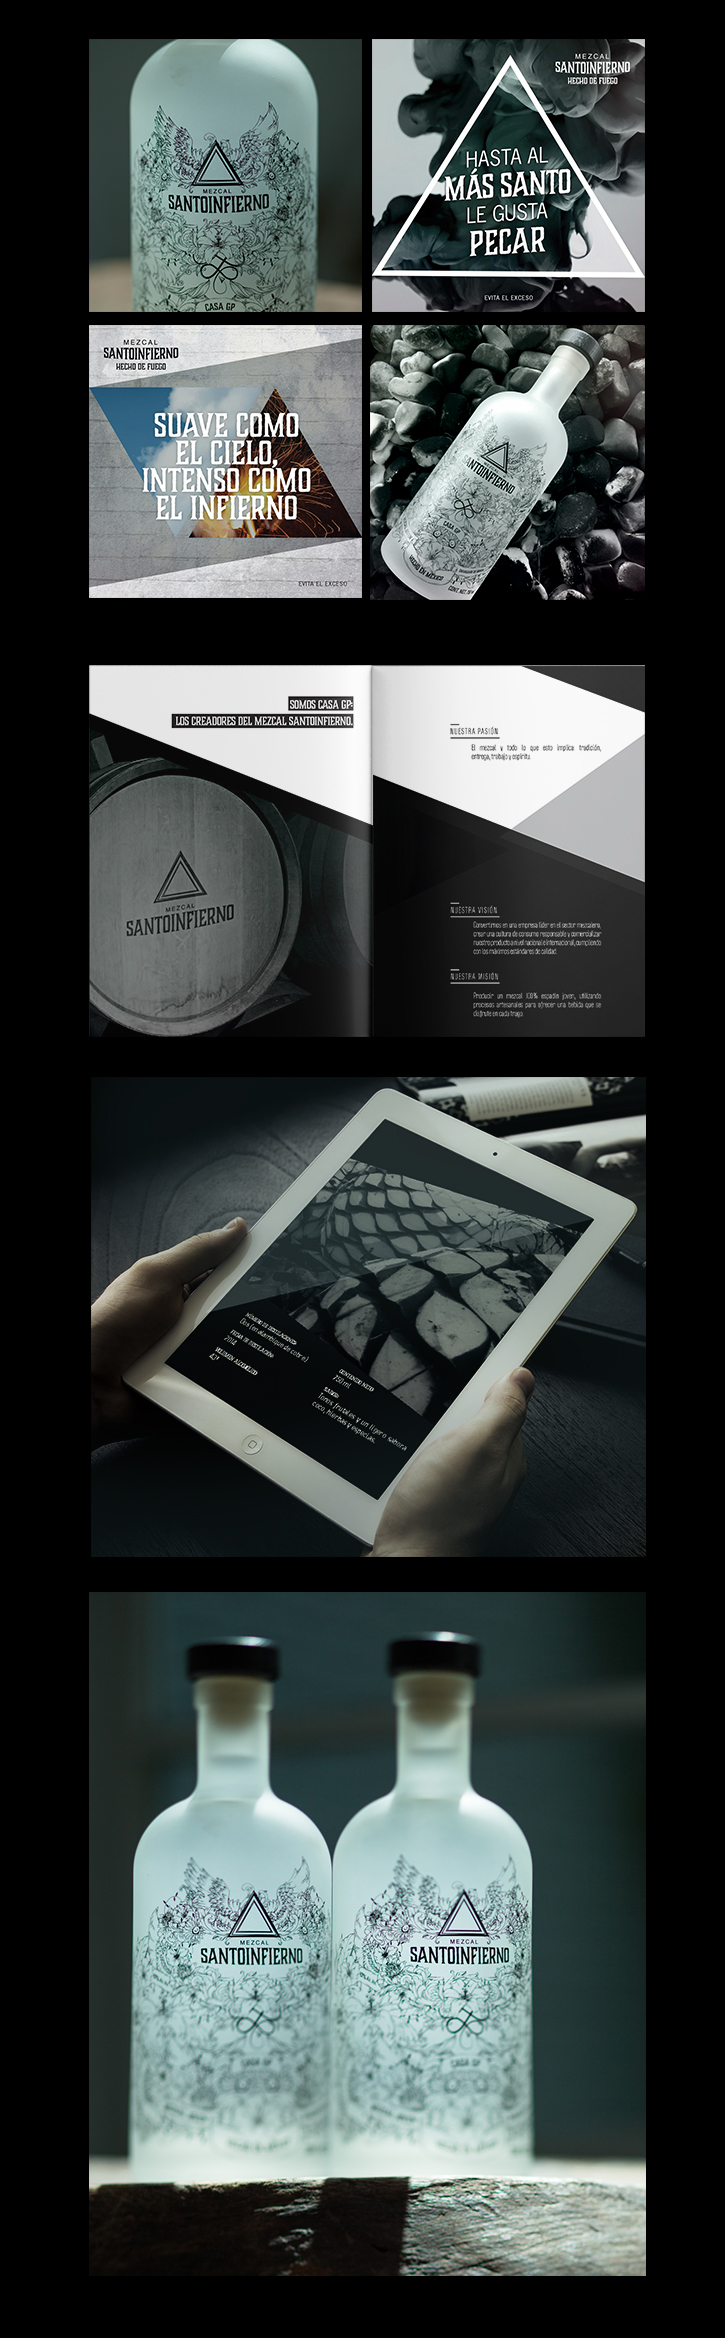 Advertising  creative mezcal brand creatividad publicitaria campaña publicitaria identidad social media Spots art direction